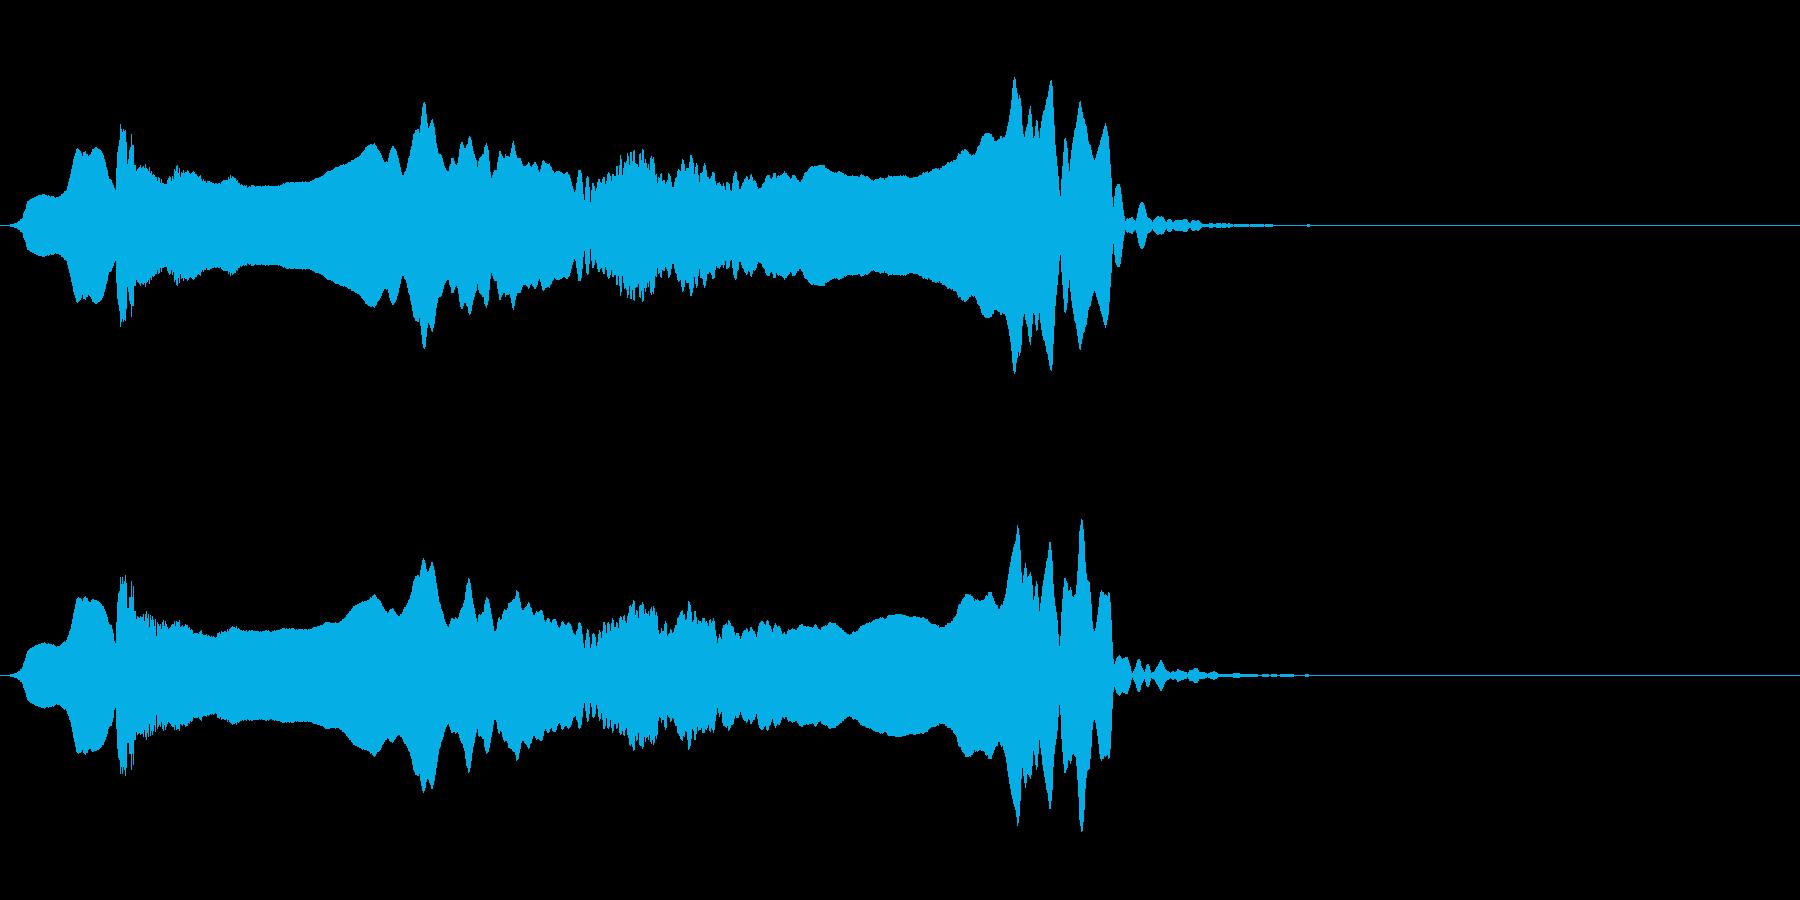 尺八 生演奏 古典風 残響音有 #15の再生済みの波形